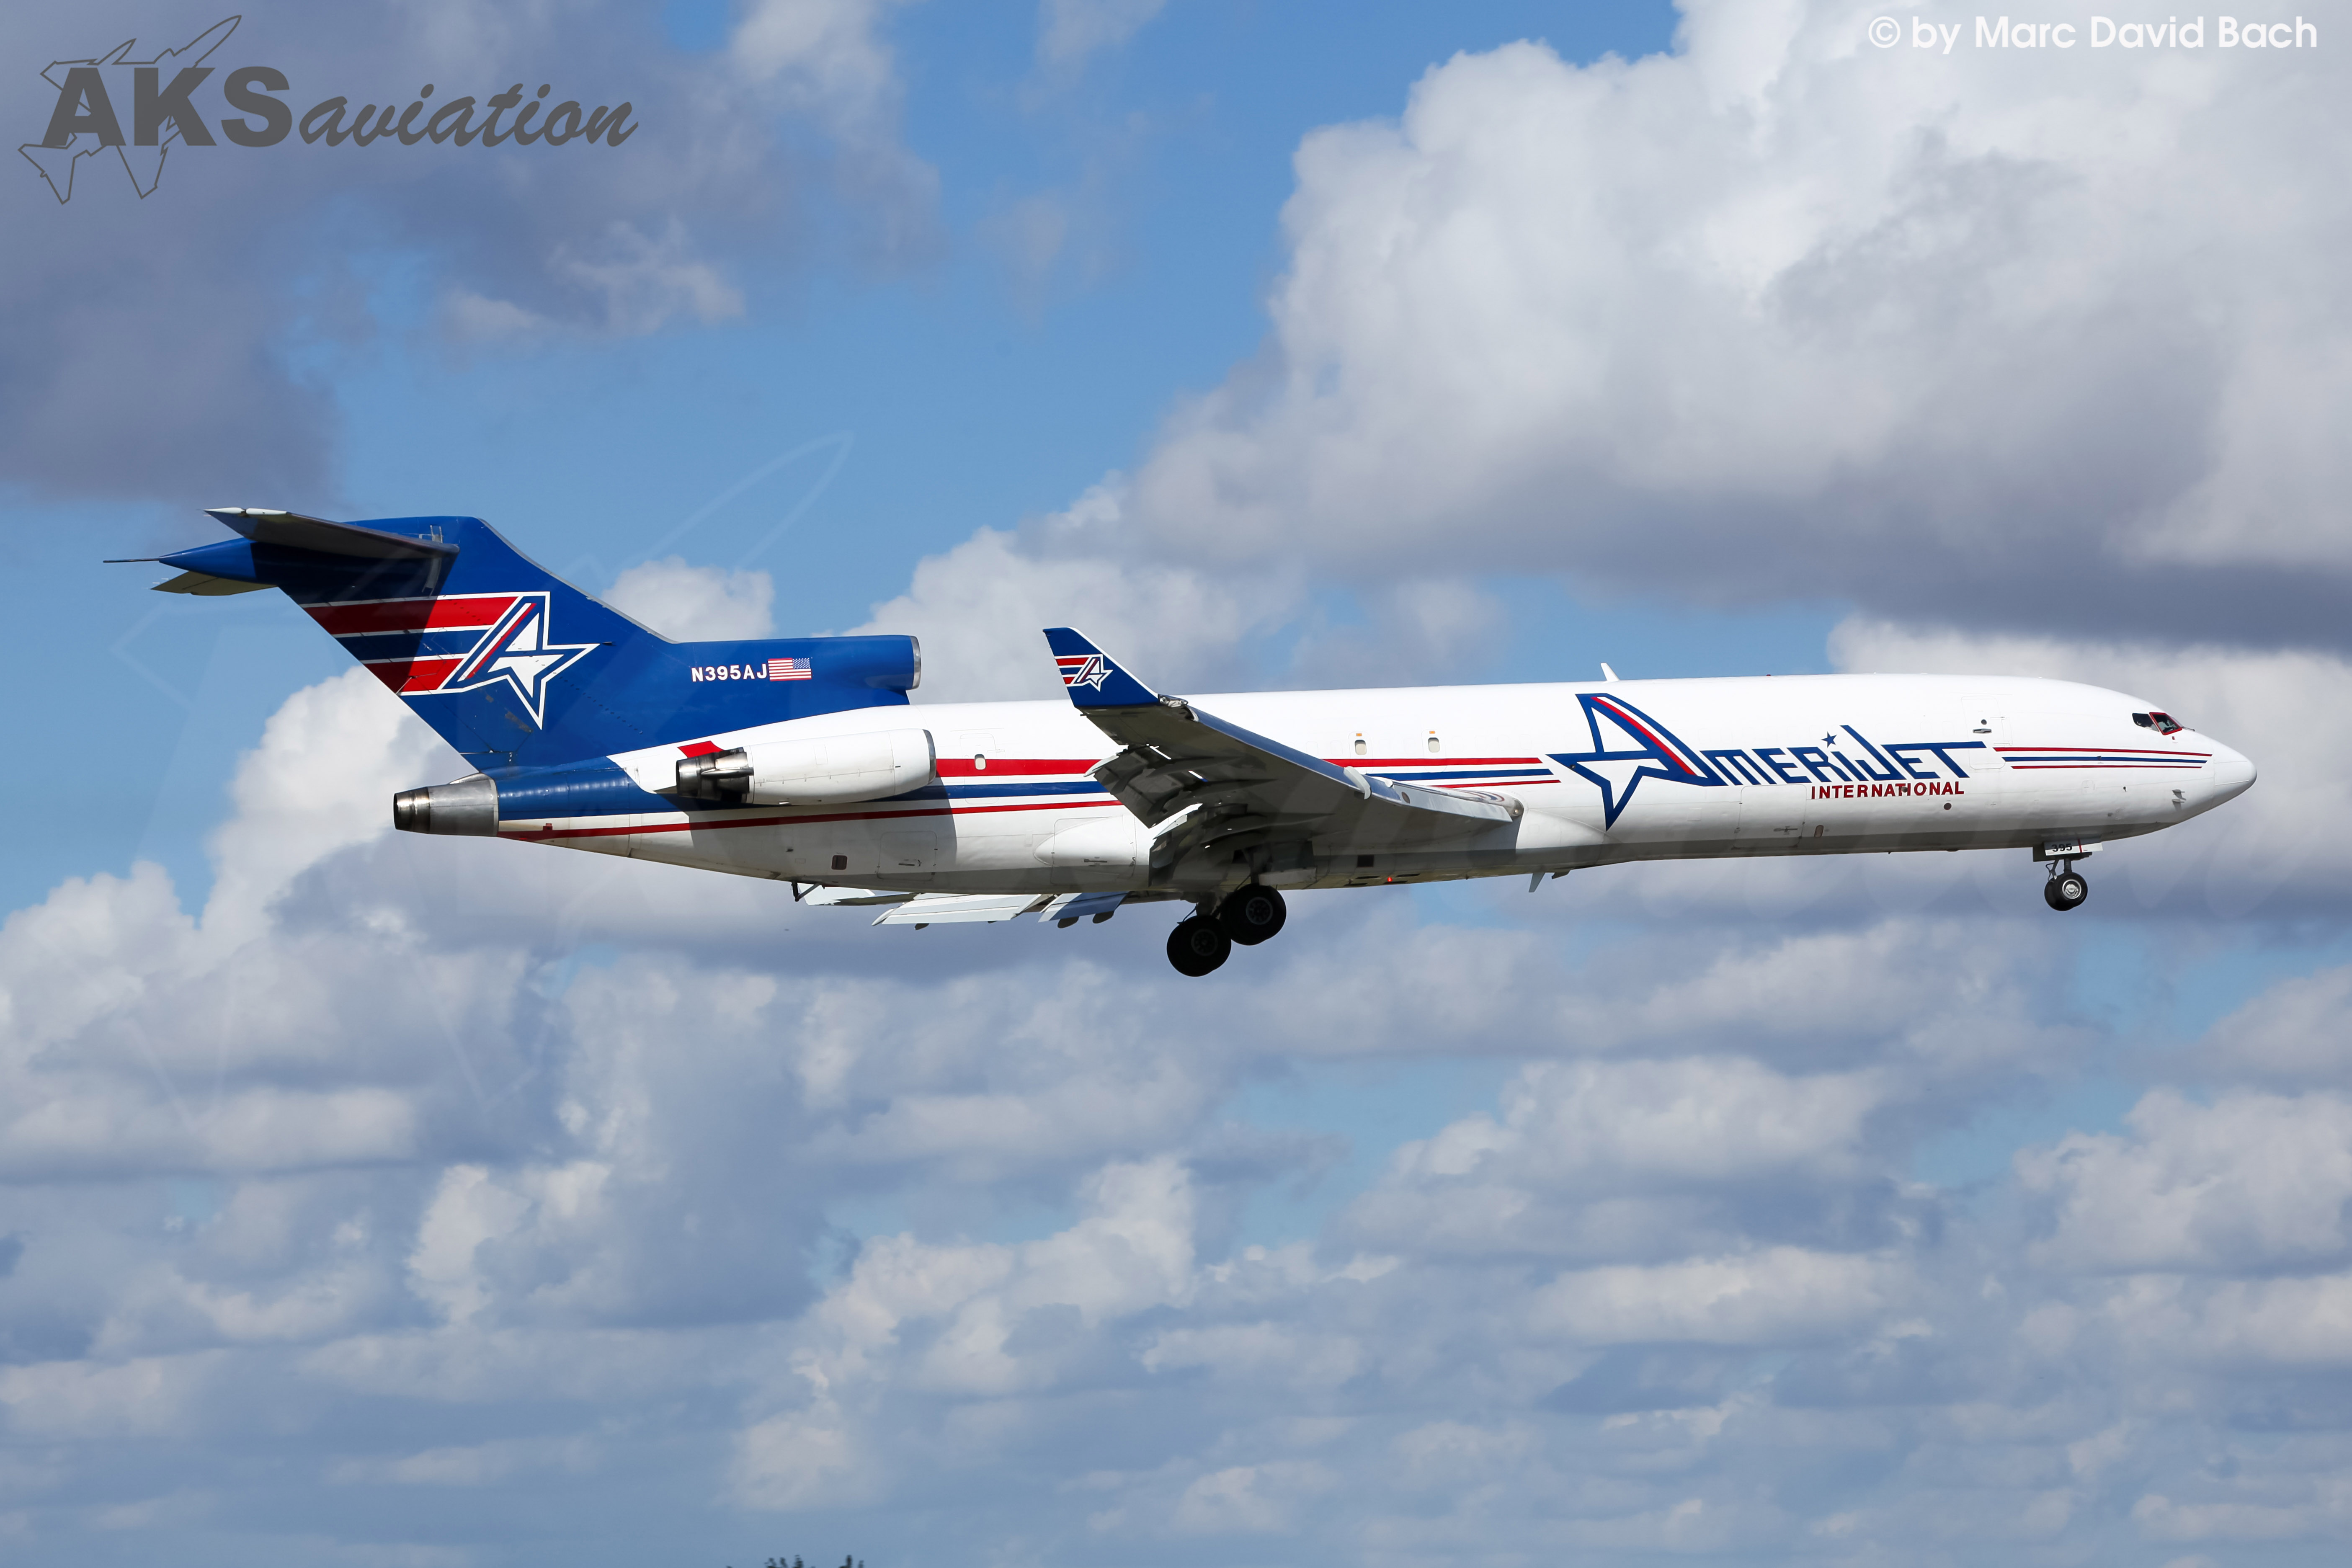 [CIVIL] Boeing 727-233_Adv_F  N395AJ  Amerijet International Airlines